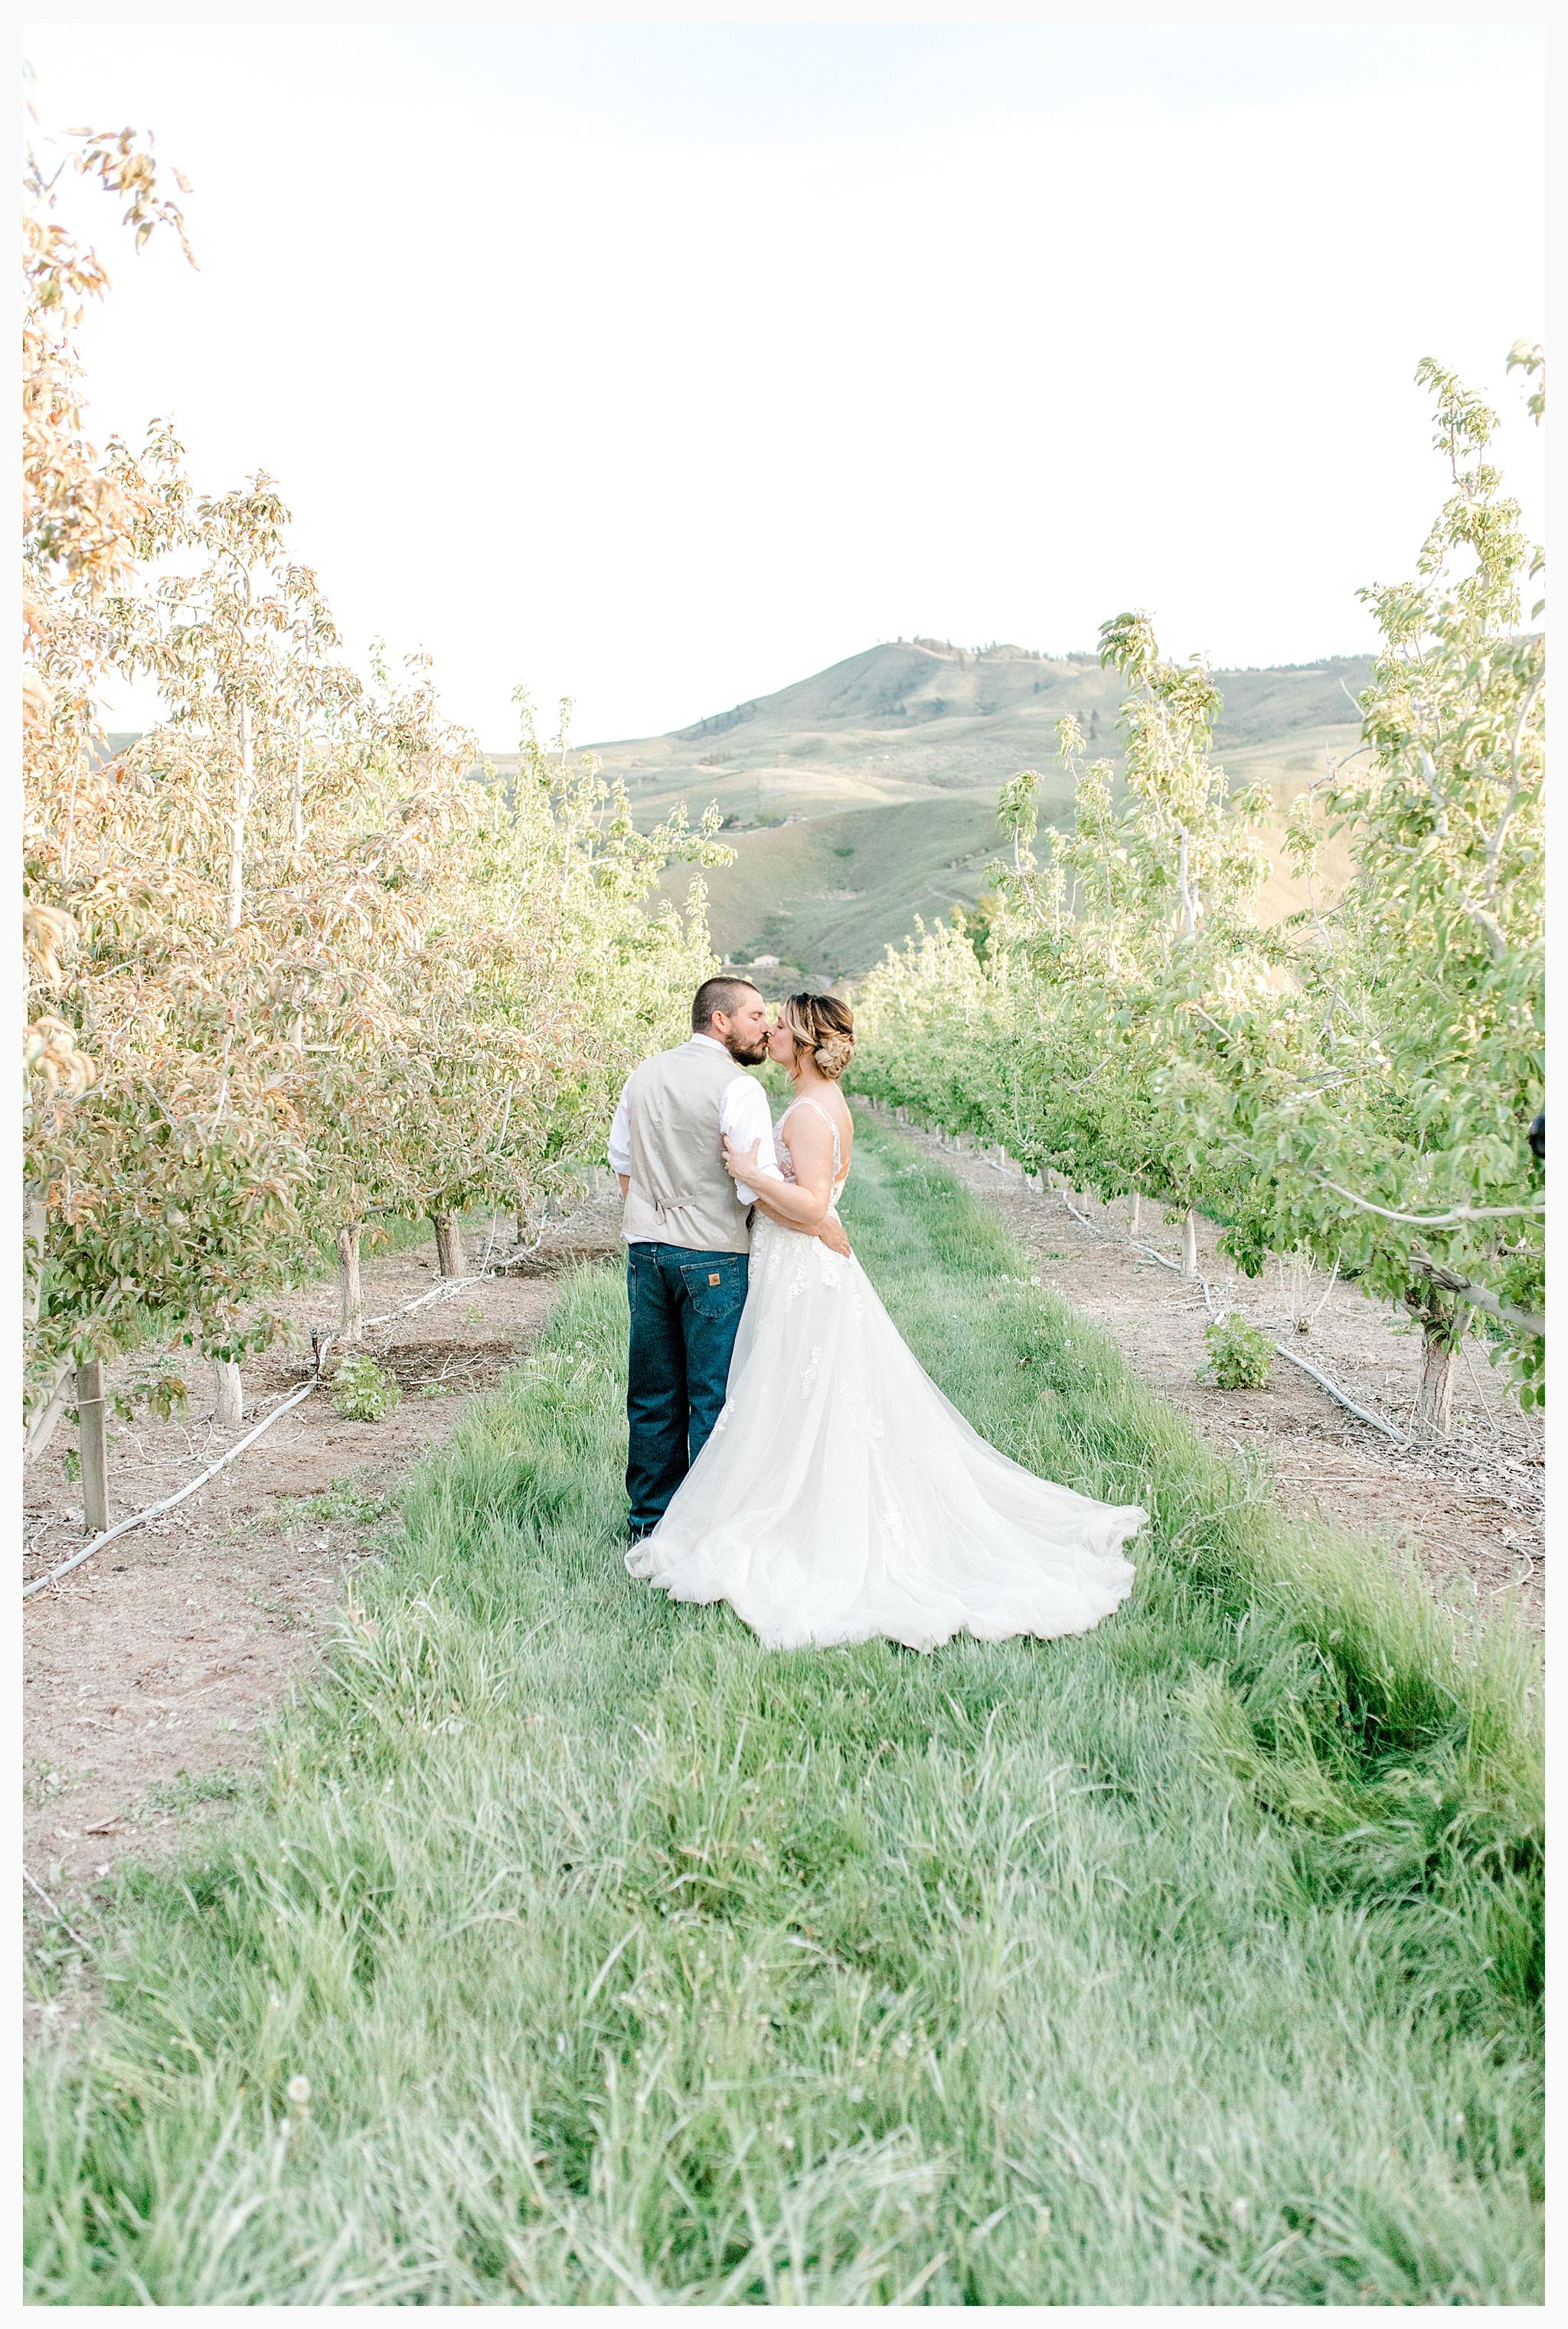 Rustic barn wedding in Wenatchee Washington at Sunshine Ranch on Easy Street, Emma Rose Company Seattle PNW Light and Airy Wedding Photographer_0139.jpg